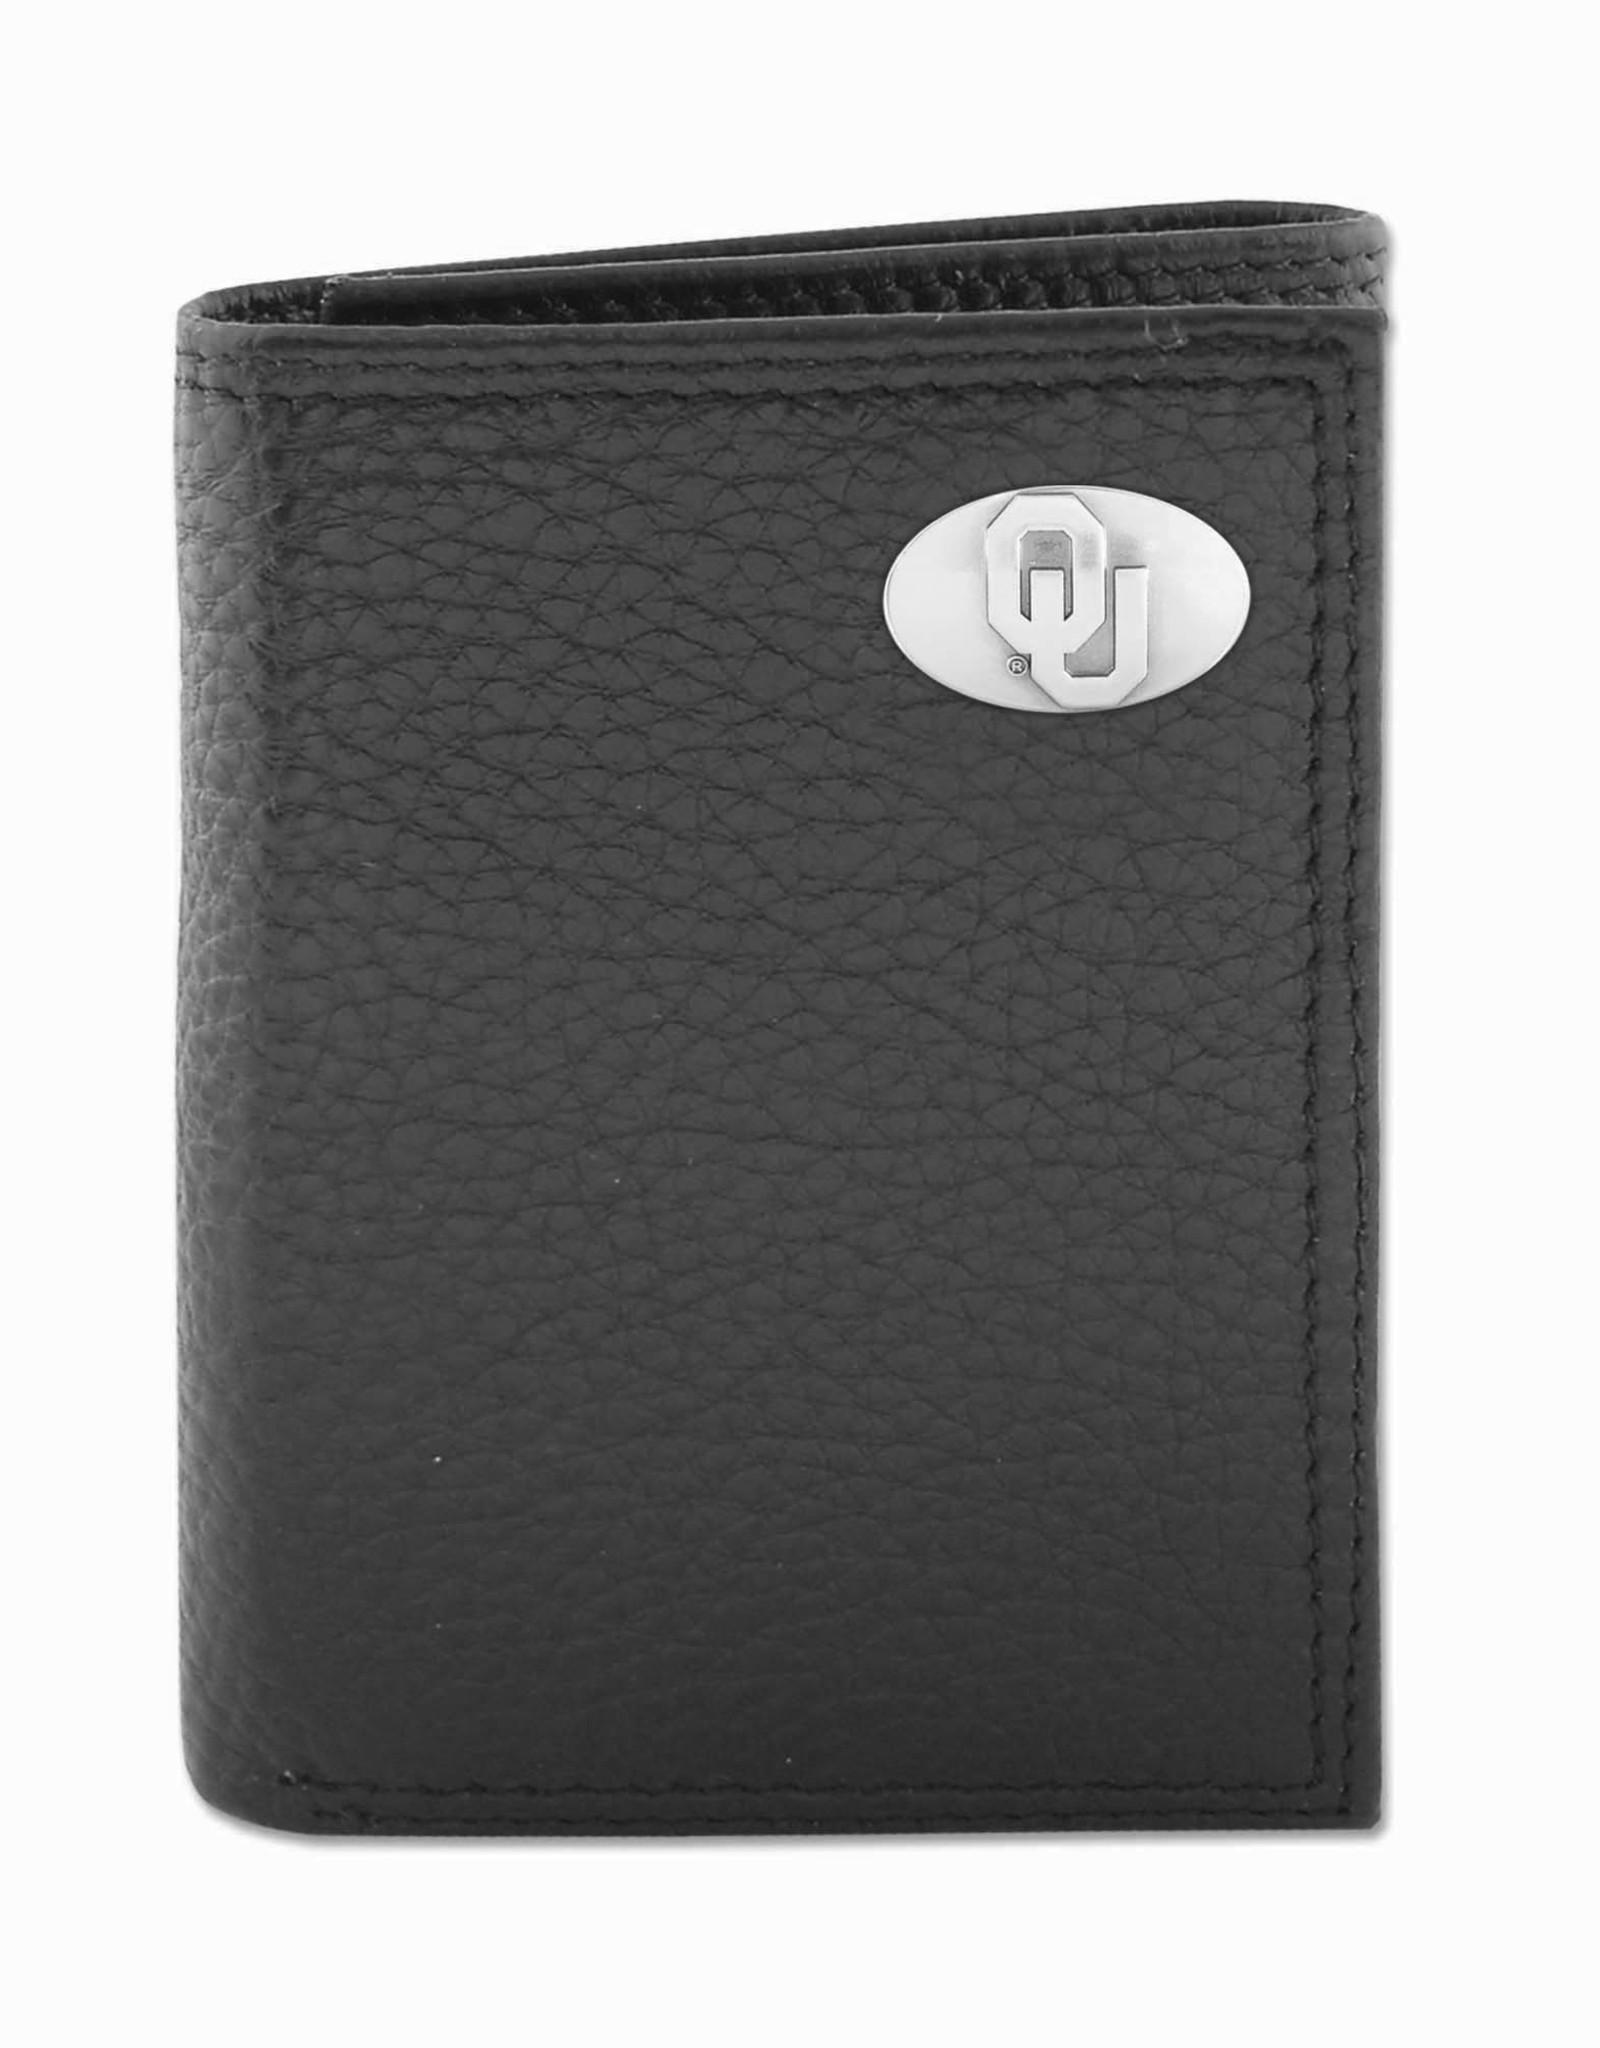 Zep-Pro Zep-Pro Black Pebble Grain Trifold Wallet